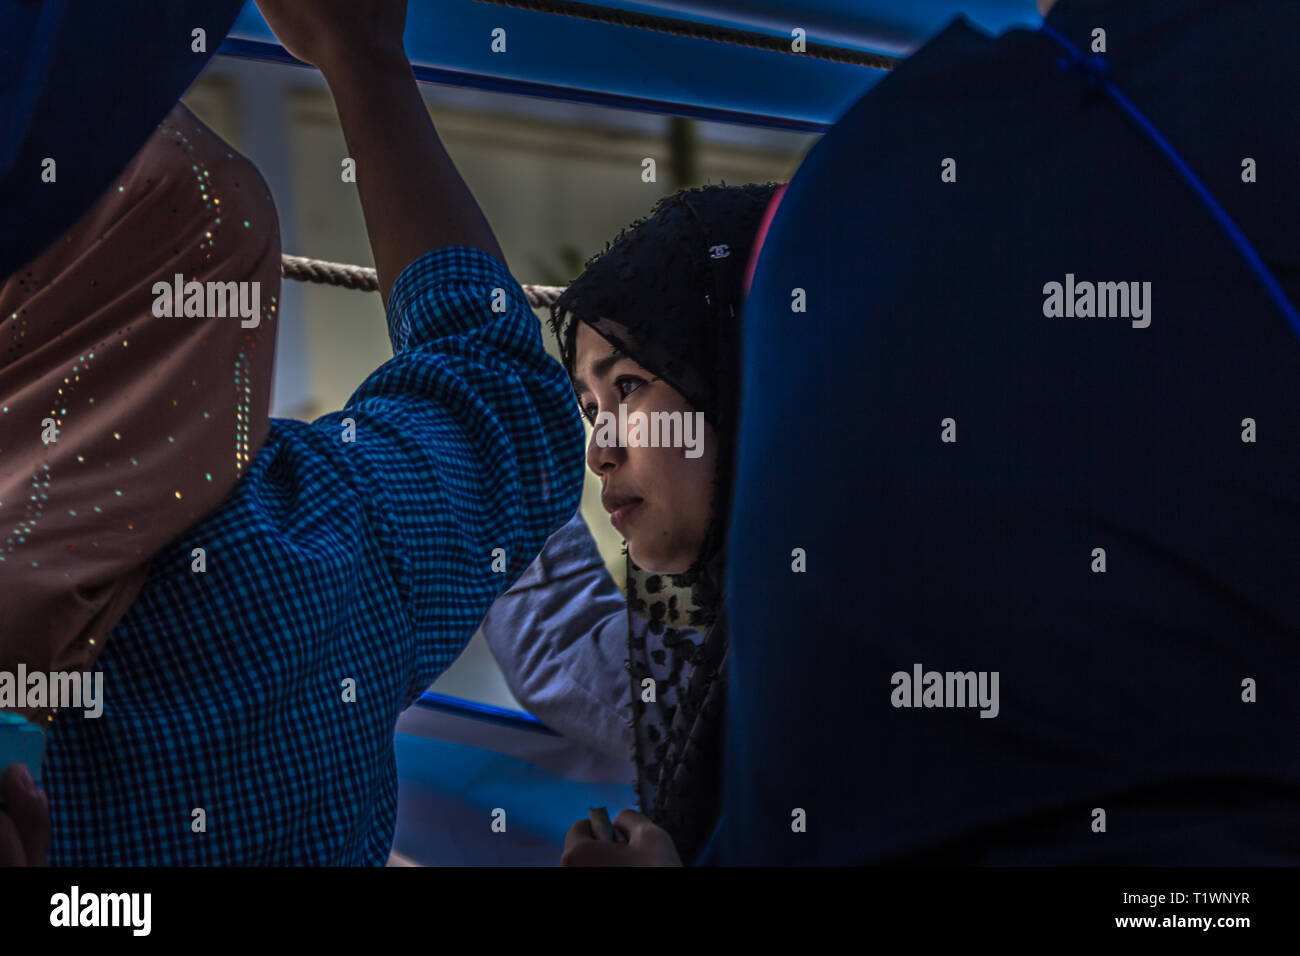 Tailandese donne musulmane passeggeri del canal boat a Bangkok, in Thailandia Immagini Stock